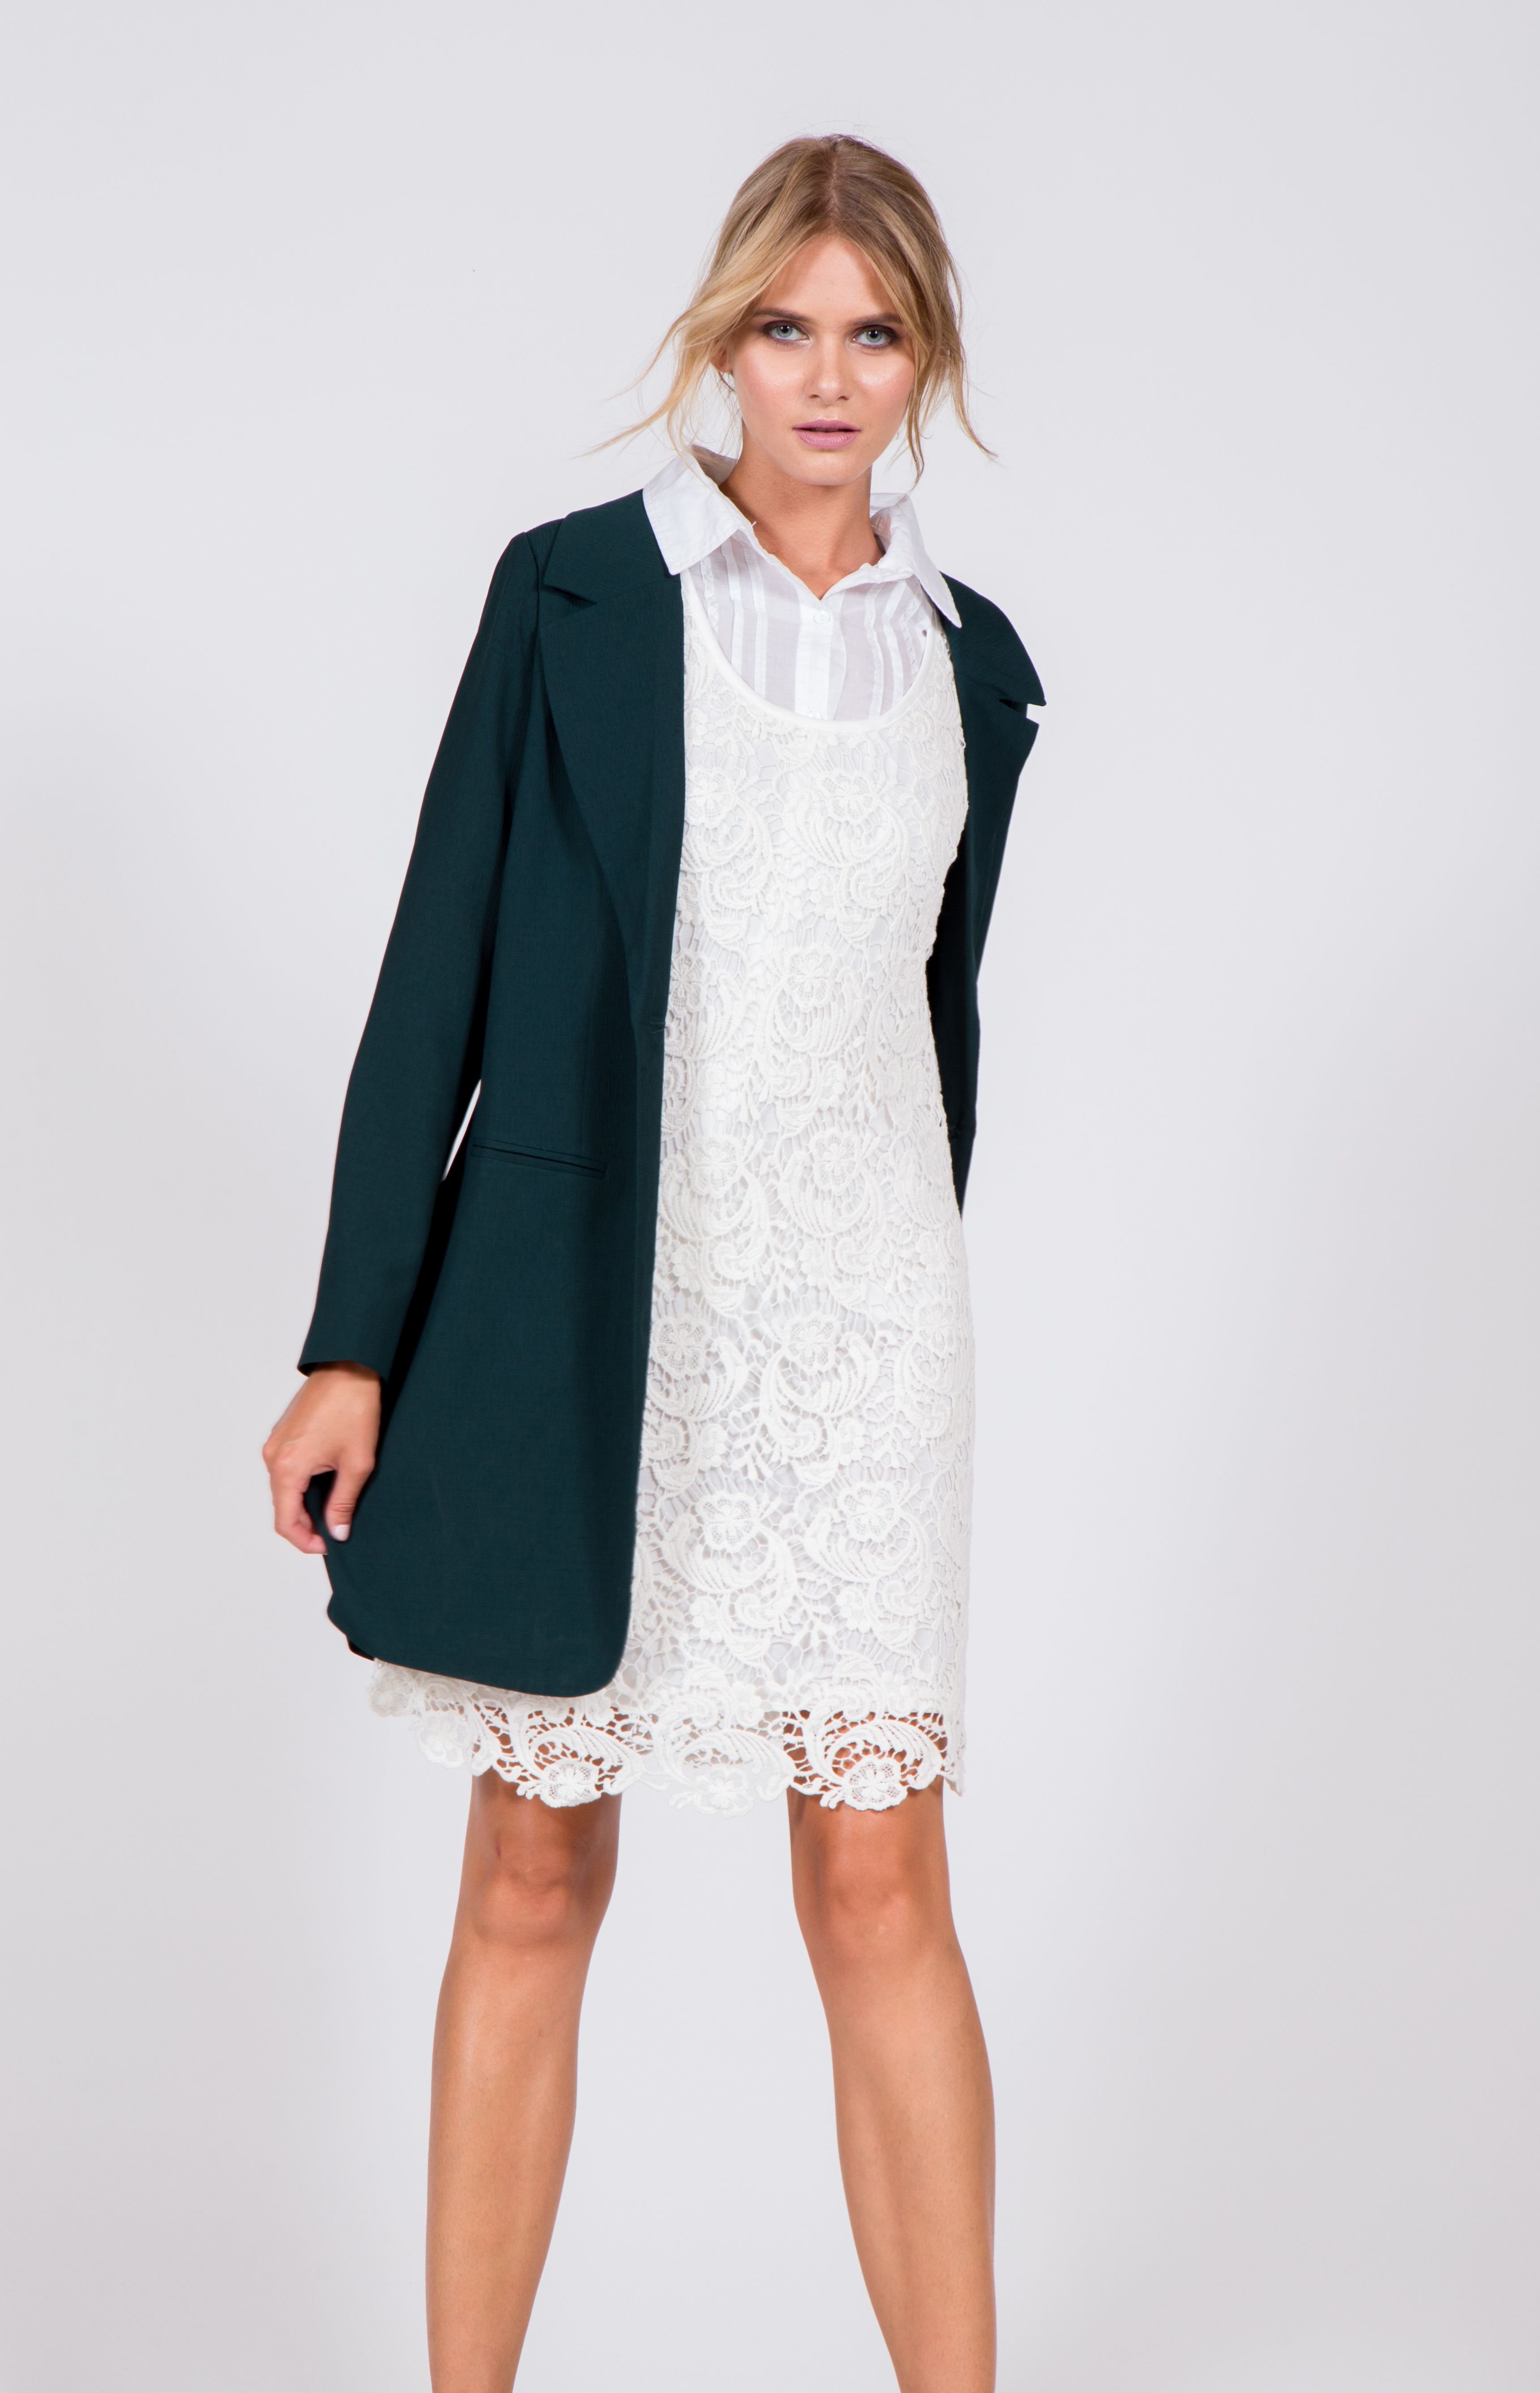 Fully lined sleeveless crochet dress long sleeve notched collar